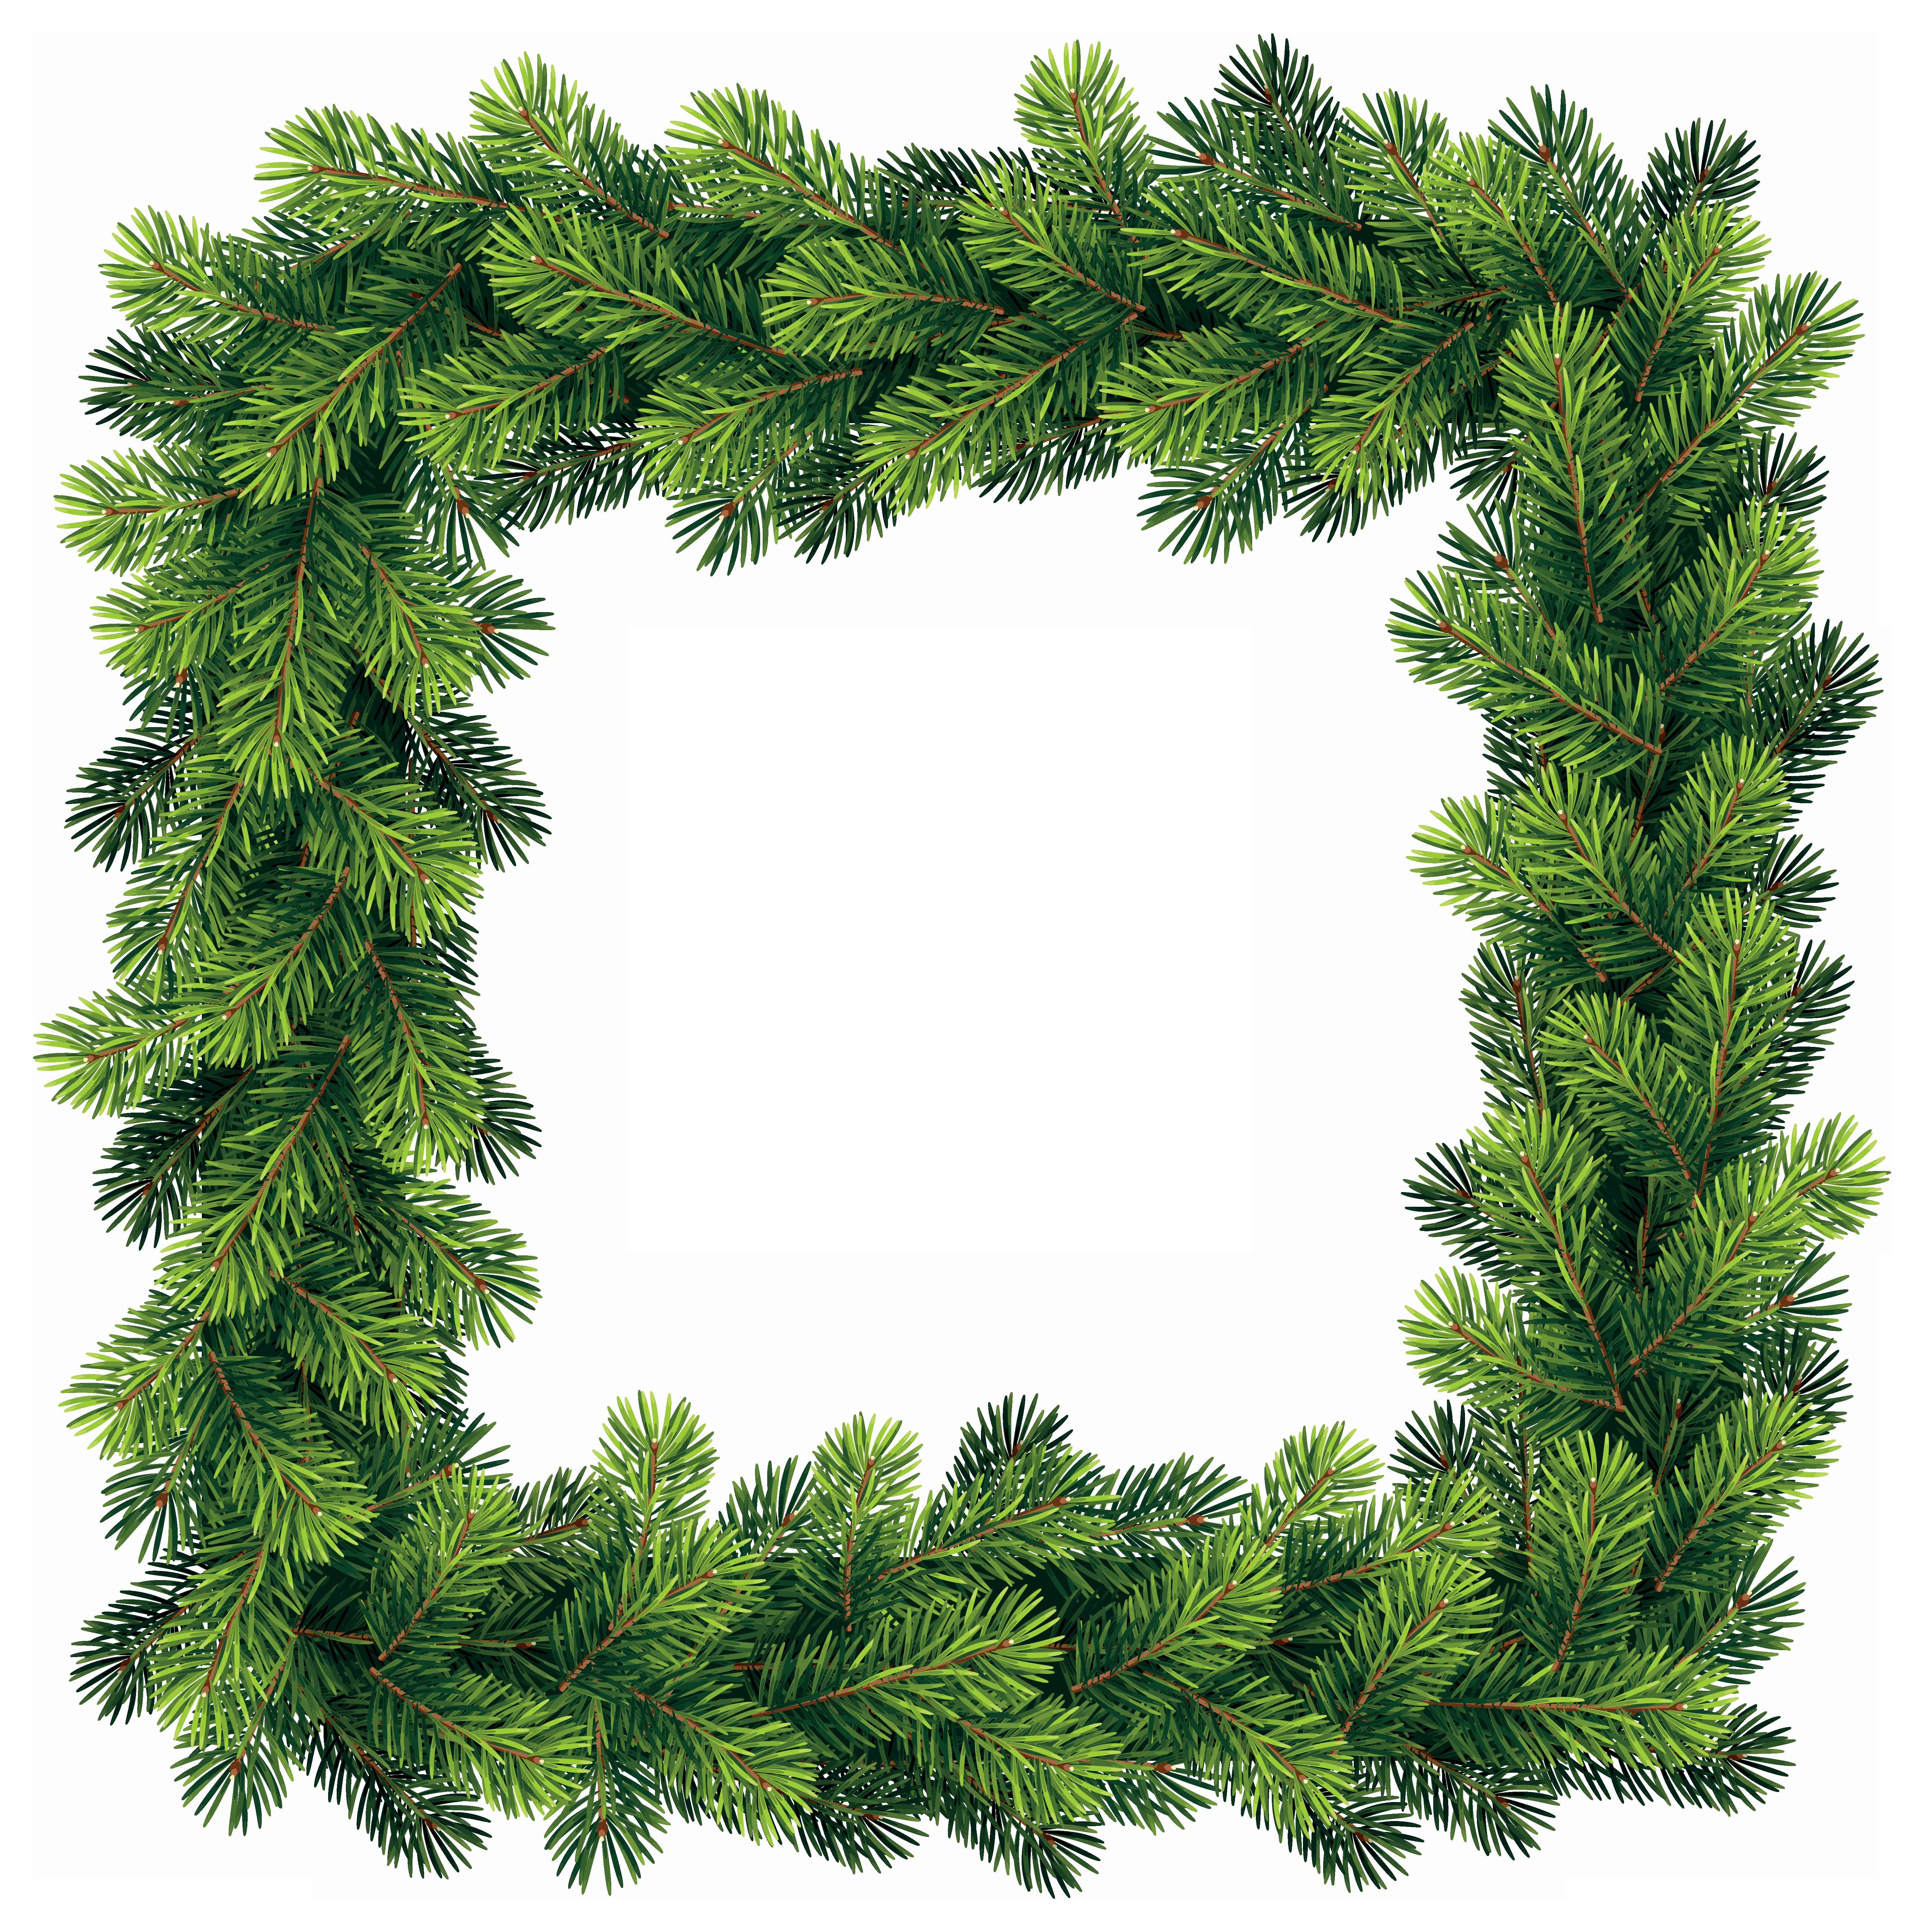 Pine tree border clipart clip download Transparent Pine Border Frame PNG Clip Art Image | Gallery ... clip download